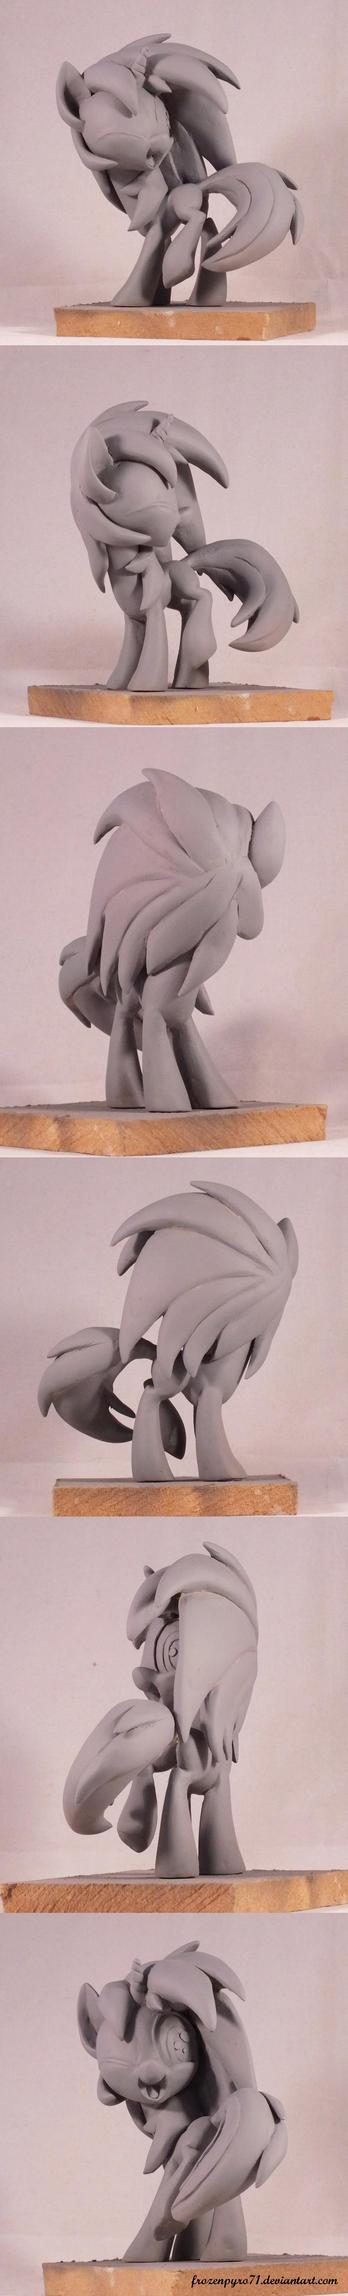 Vinyl scratch - sculpt spin by frozenpyro71